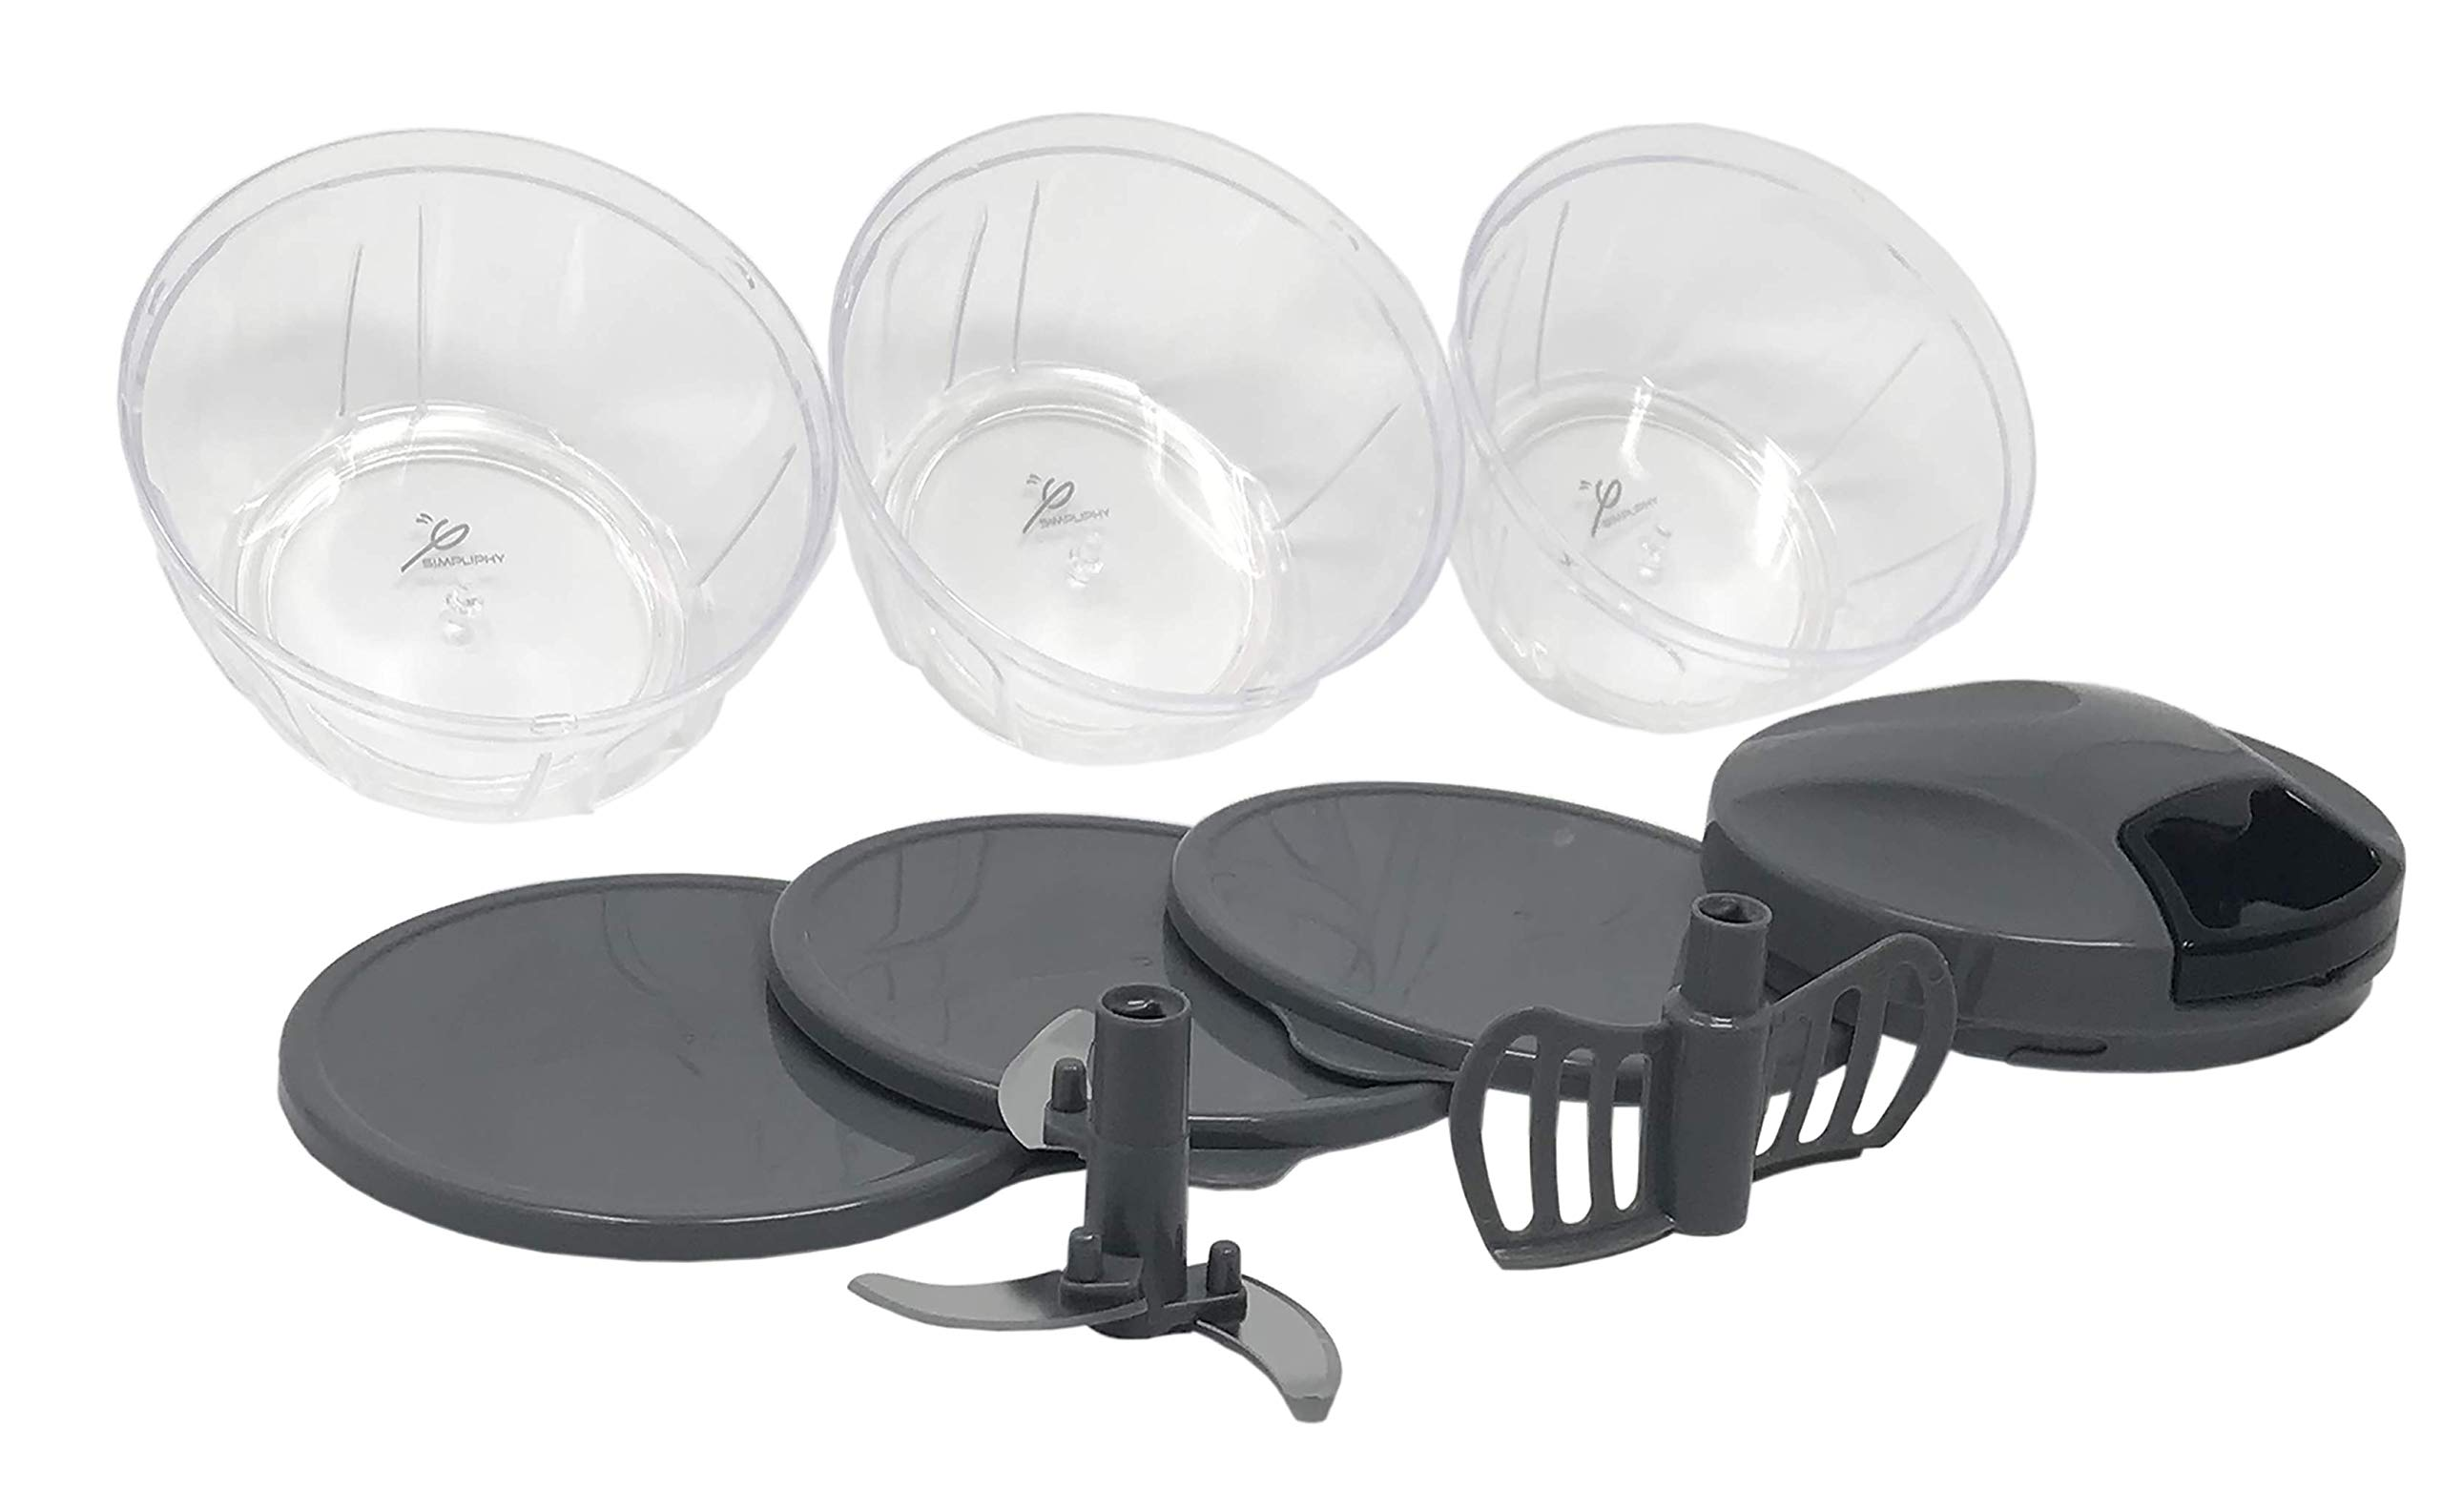 Tribowl Apache, Pull Cord Food Chopper Speedy Crank Chop with bowls, lids + blender attachment